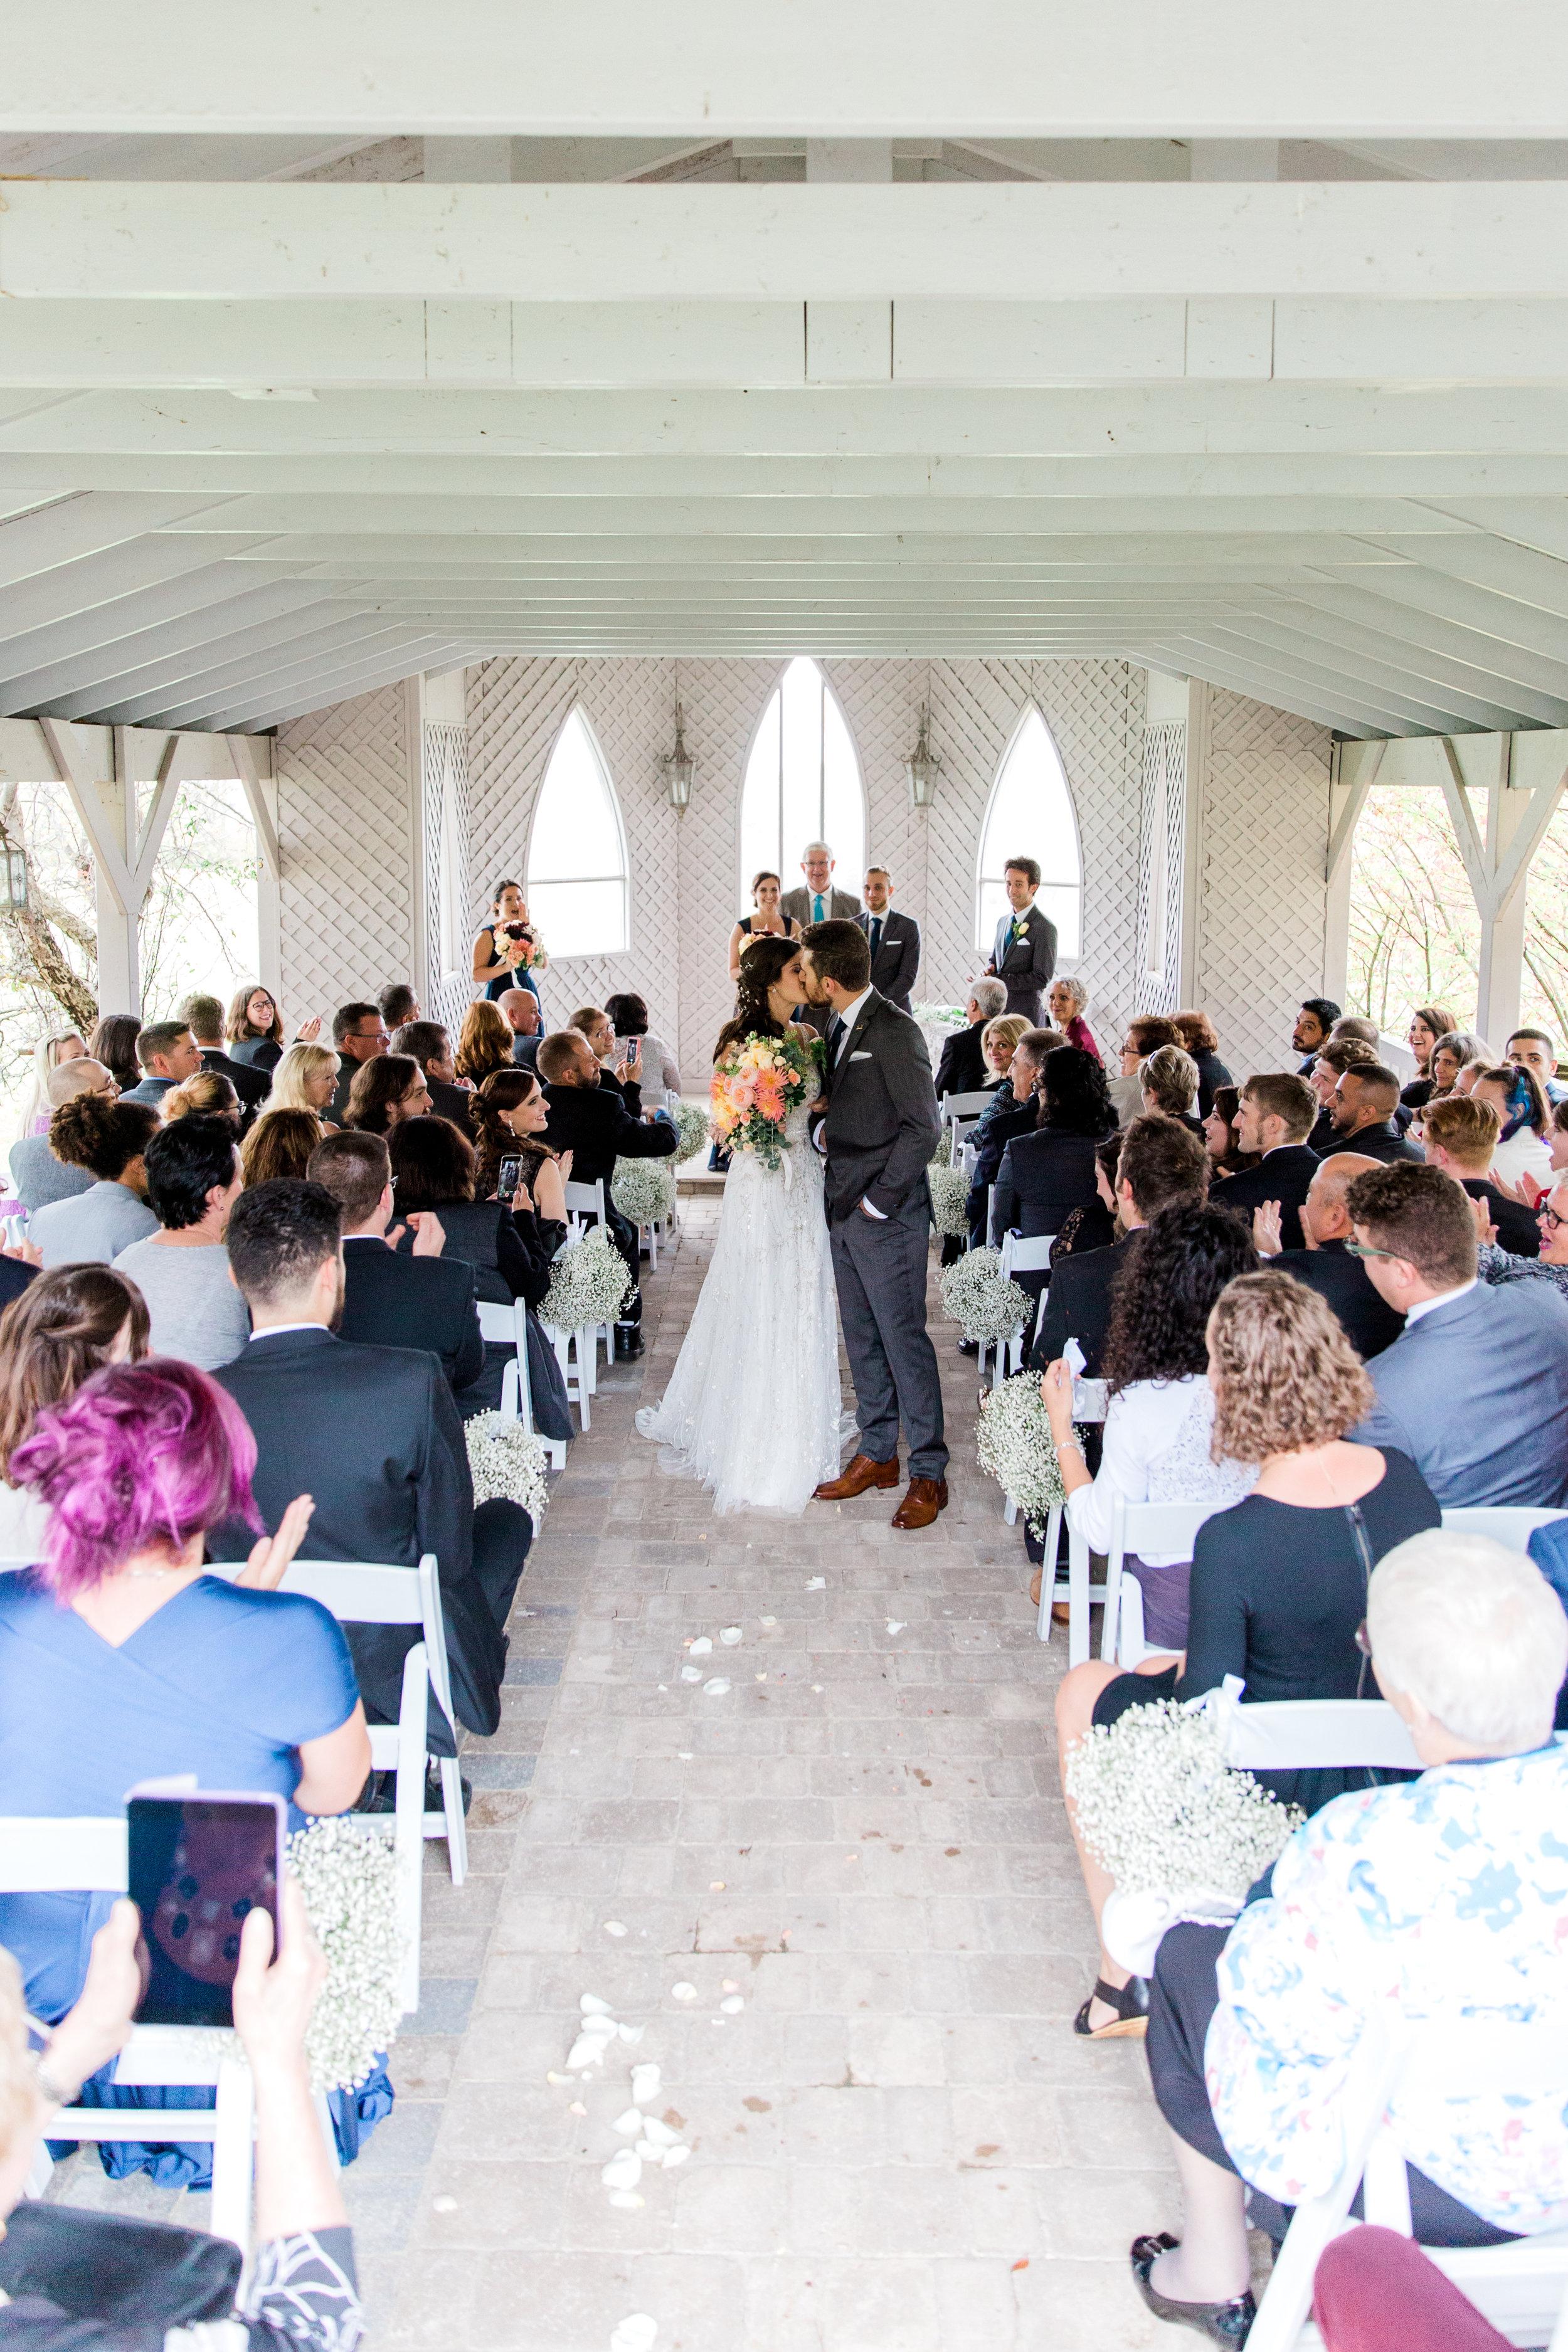 Amir-Golbazi-Danielle-Giroux-Photography_Toronto-Wedding_Cedarwood_Rachel-Paul_231.jpg